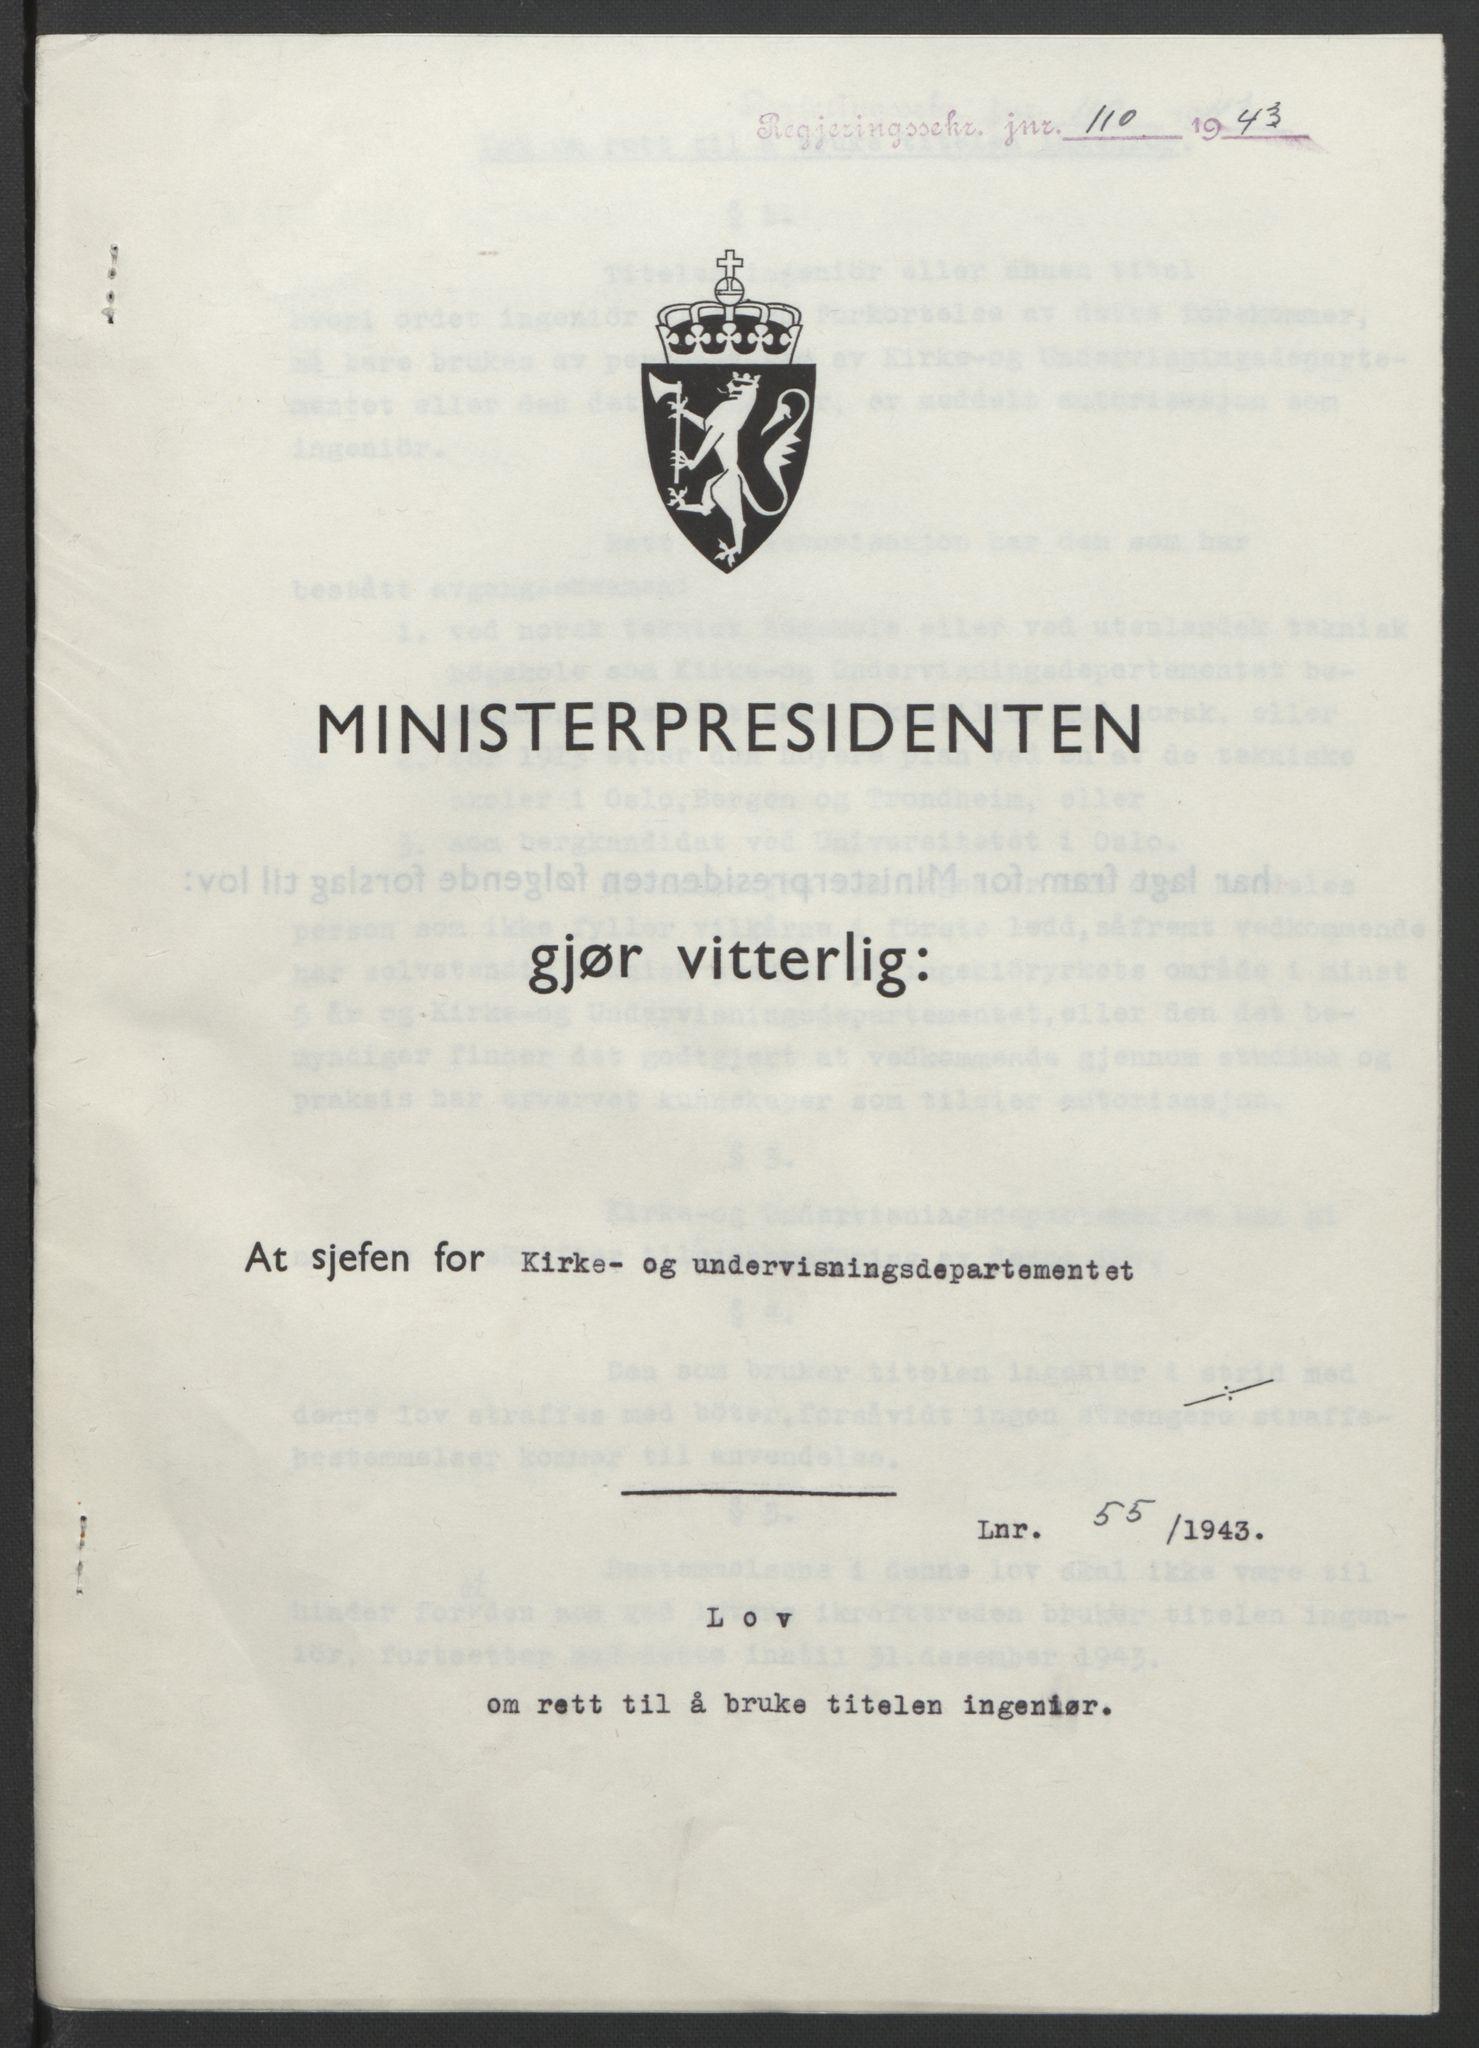 RA, NS-administrasjonen 1940-1945 (Statsrådsekretariatet, de kommisariske statsråder mm), D/Db/L0099: Lover, 1943, s. 248